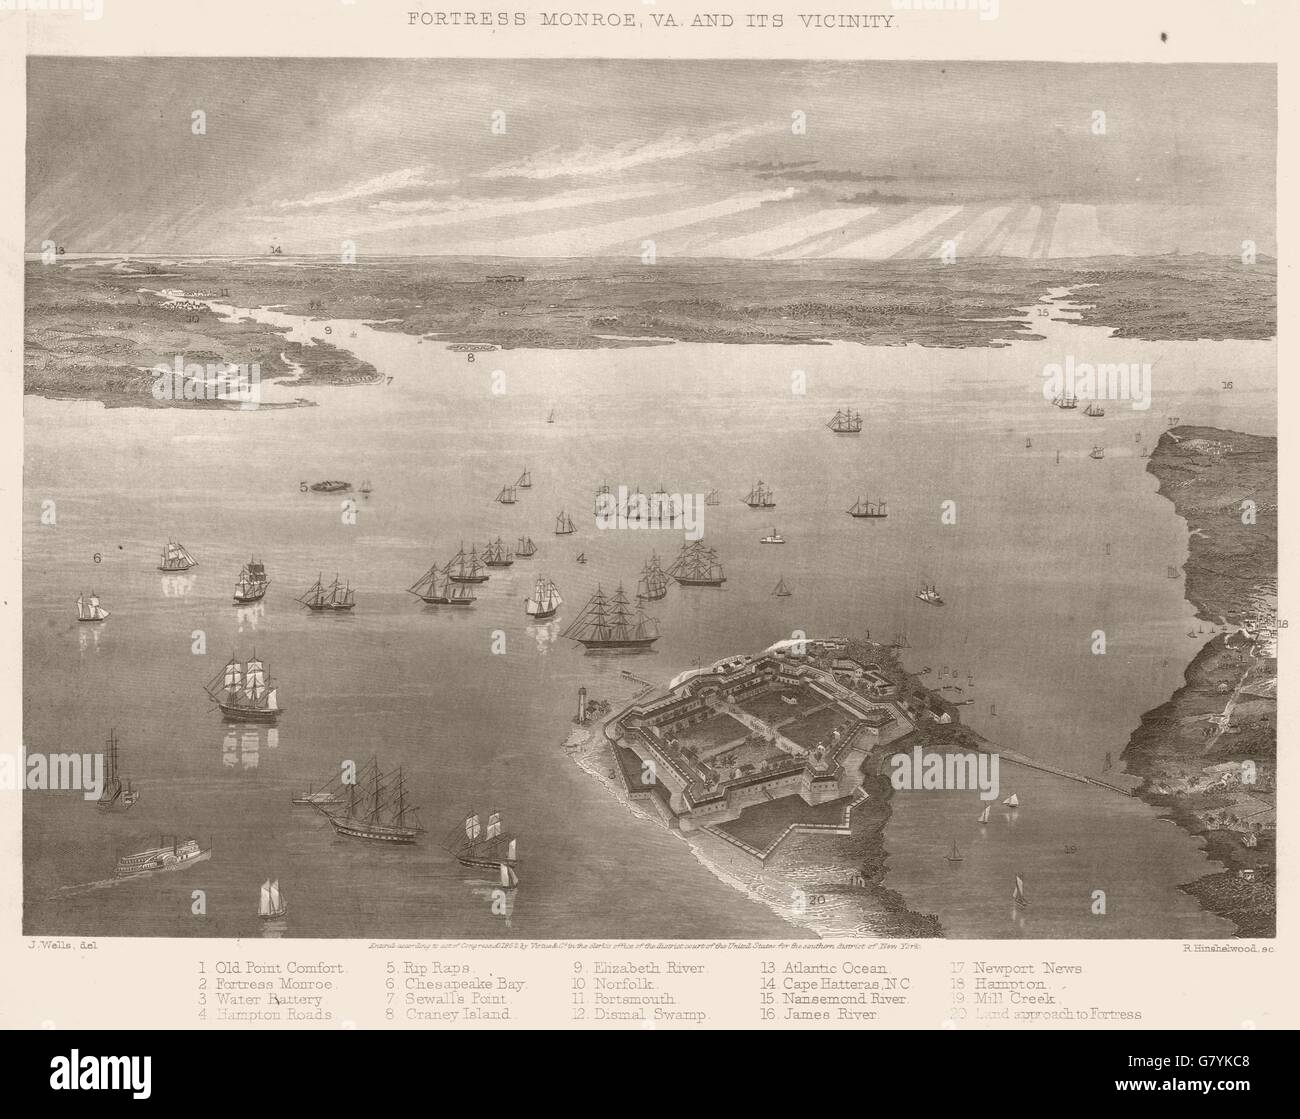 American civil war aerial photography — img 1